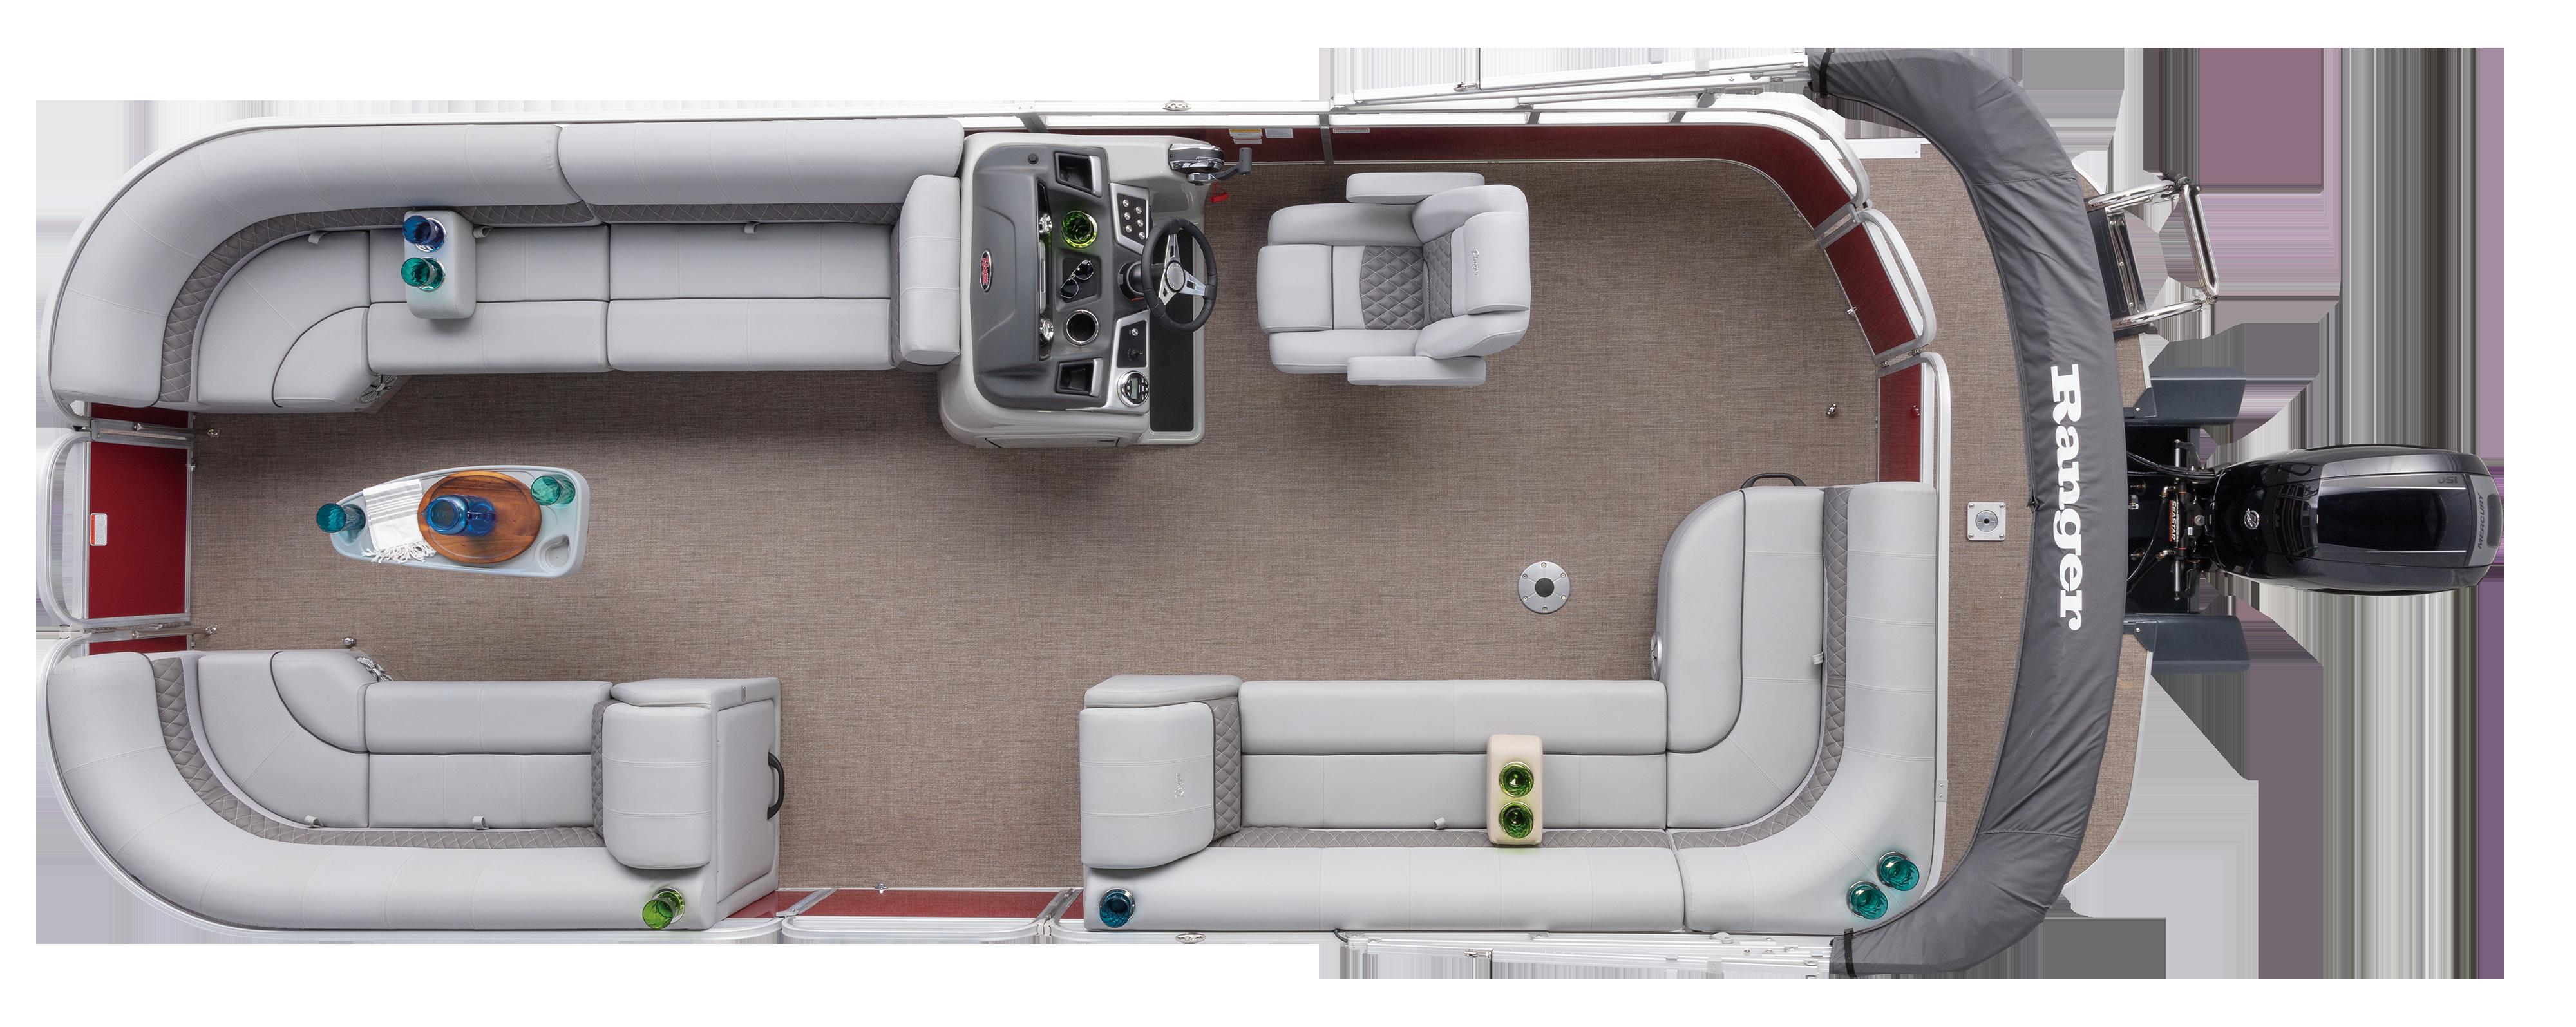 Ranger Boat Fuse Box Location - Wiring Diagram